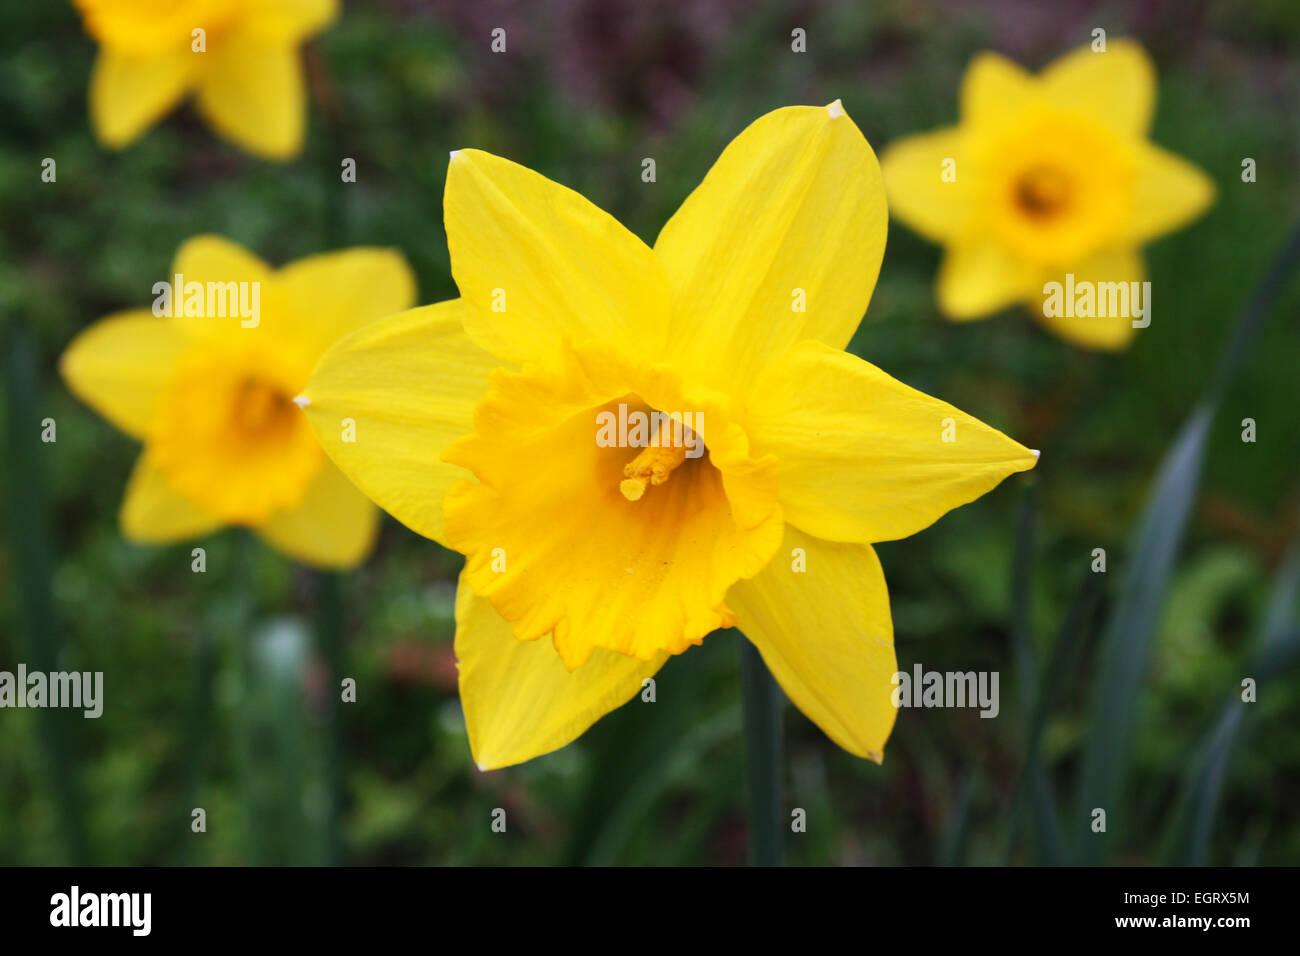 Yellow daffodil flowers in spring season Stock Photo